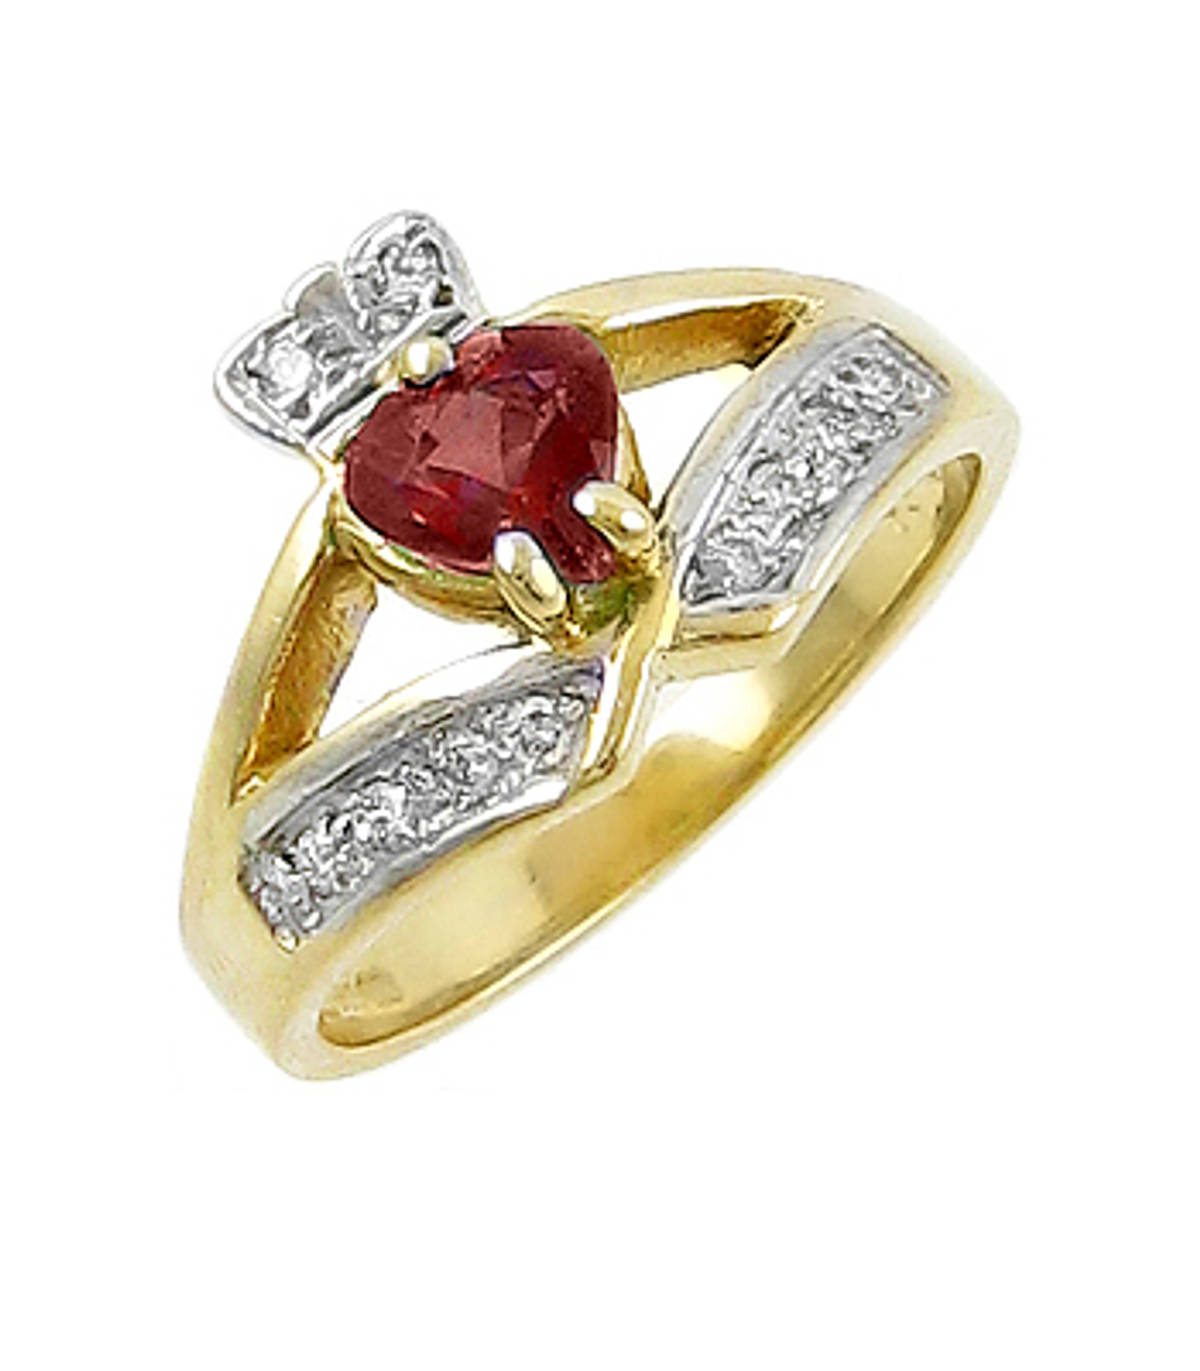 Irish made14 carat yellow gold 0.55cts garnet/0.12cts diamonds claddagh engagement ring